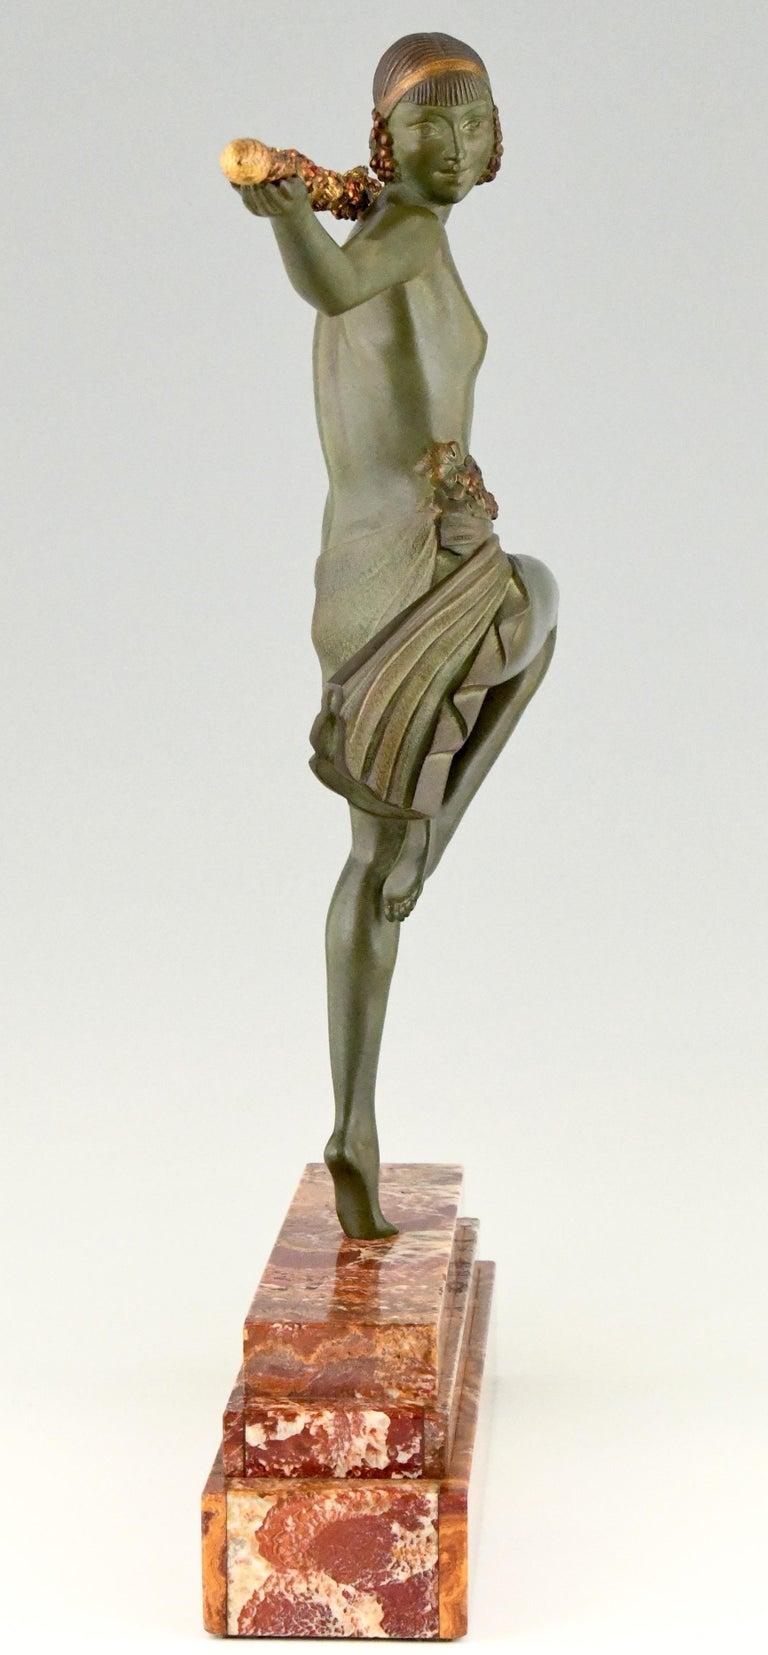 Patinated Art Deco Bronze Sculpture Nude Dancer with Thyrsus Pierre Le Faguays, 1930 For Sale